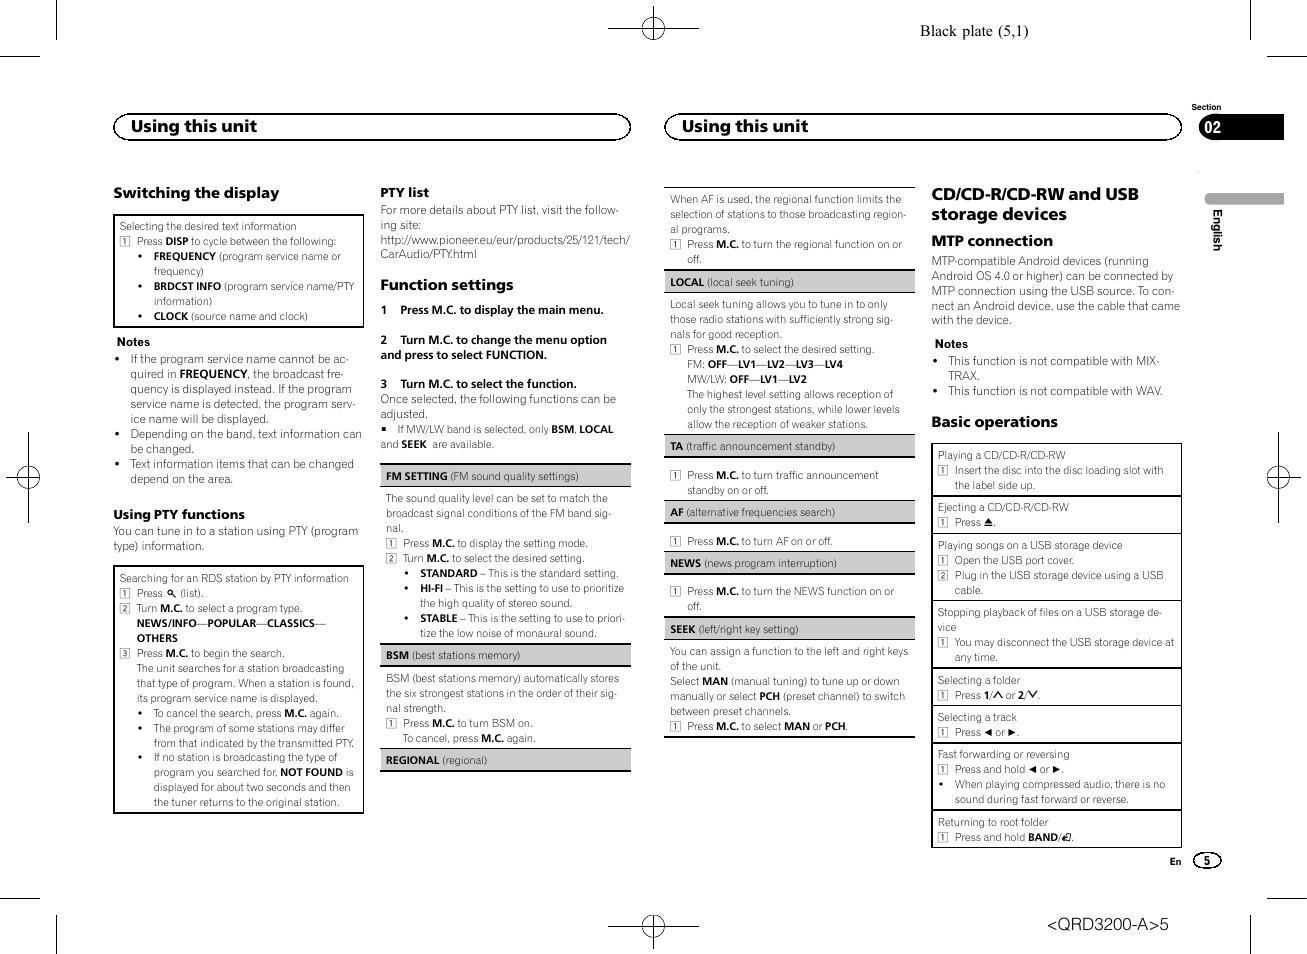 Seek (left, Af (alternative frequencies search), Cd/cd-r